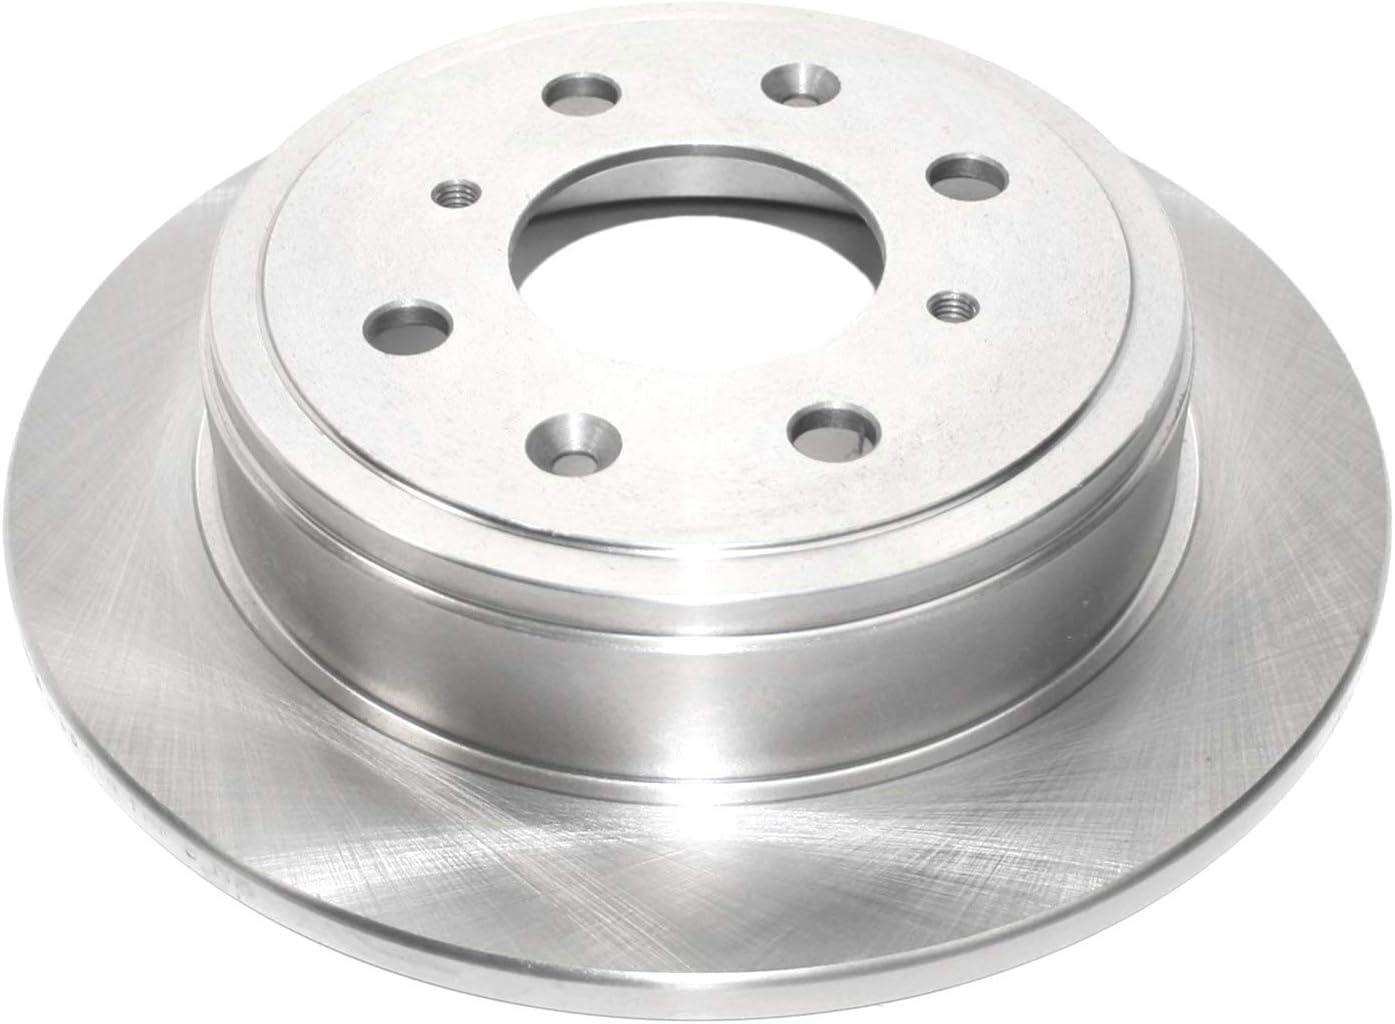 DuraGo BR3489 Rear Solid Disc Brake Rotor